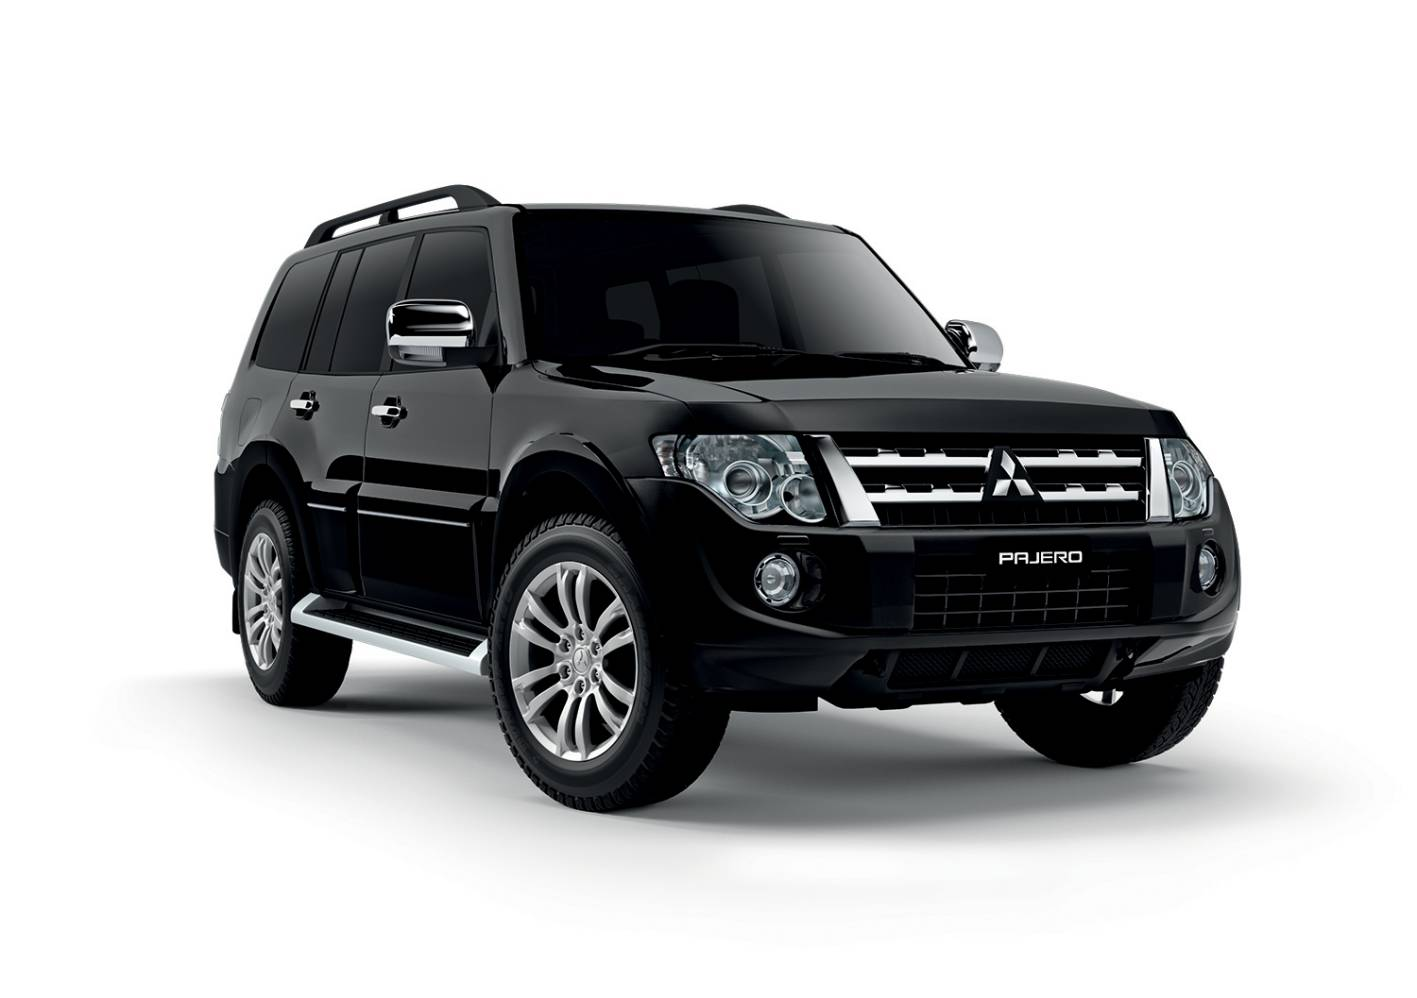 2019 Mitsubishi Outlander Design Price >> Mitsubishi Cars - News: 2014 Pajero scores 5-star ANCAP